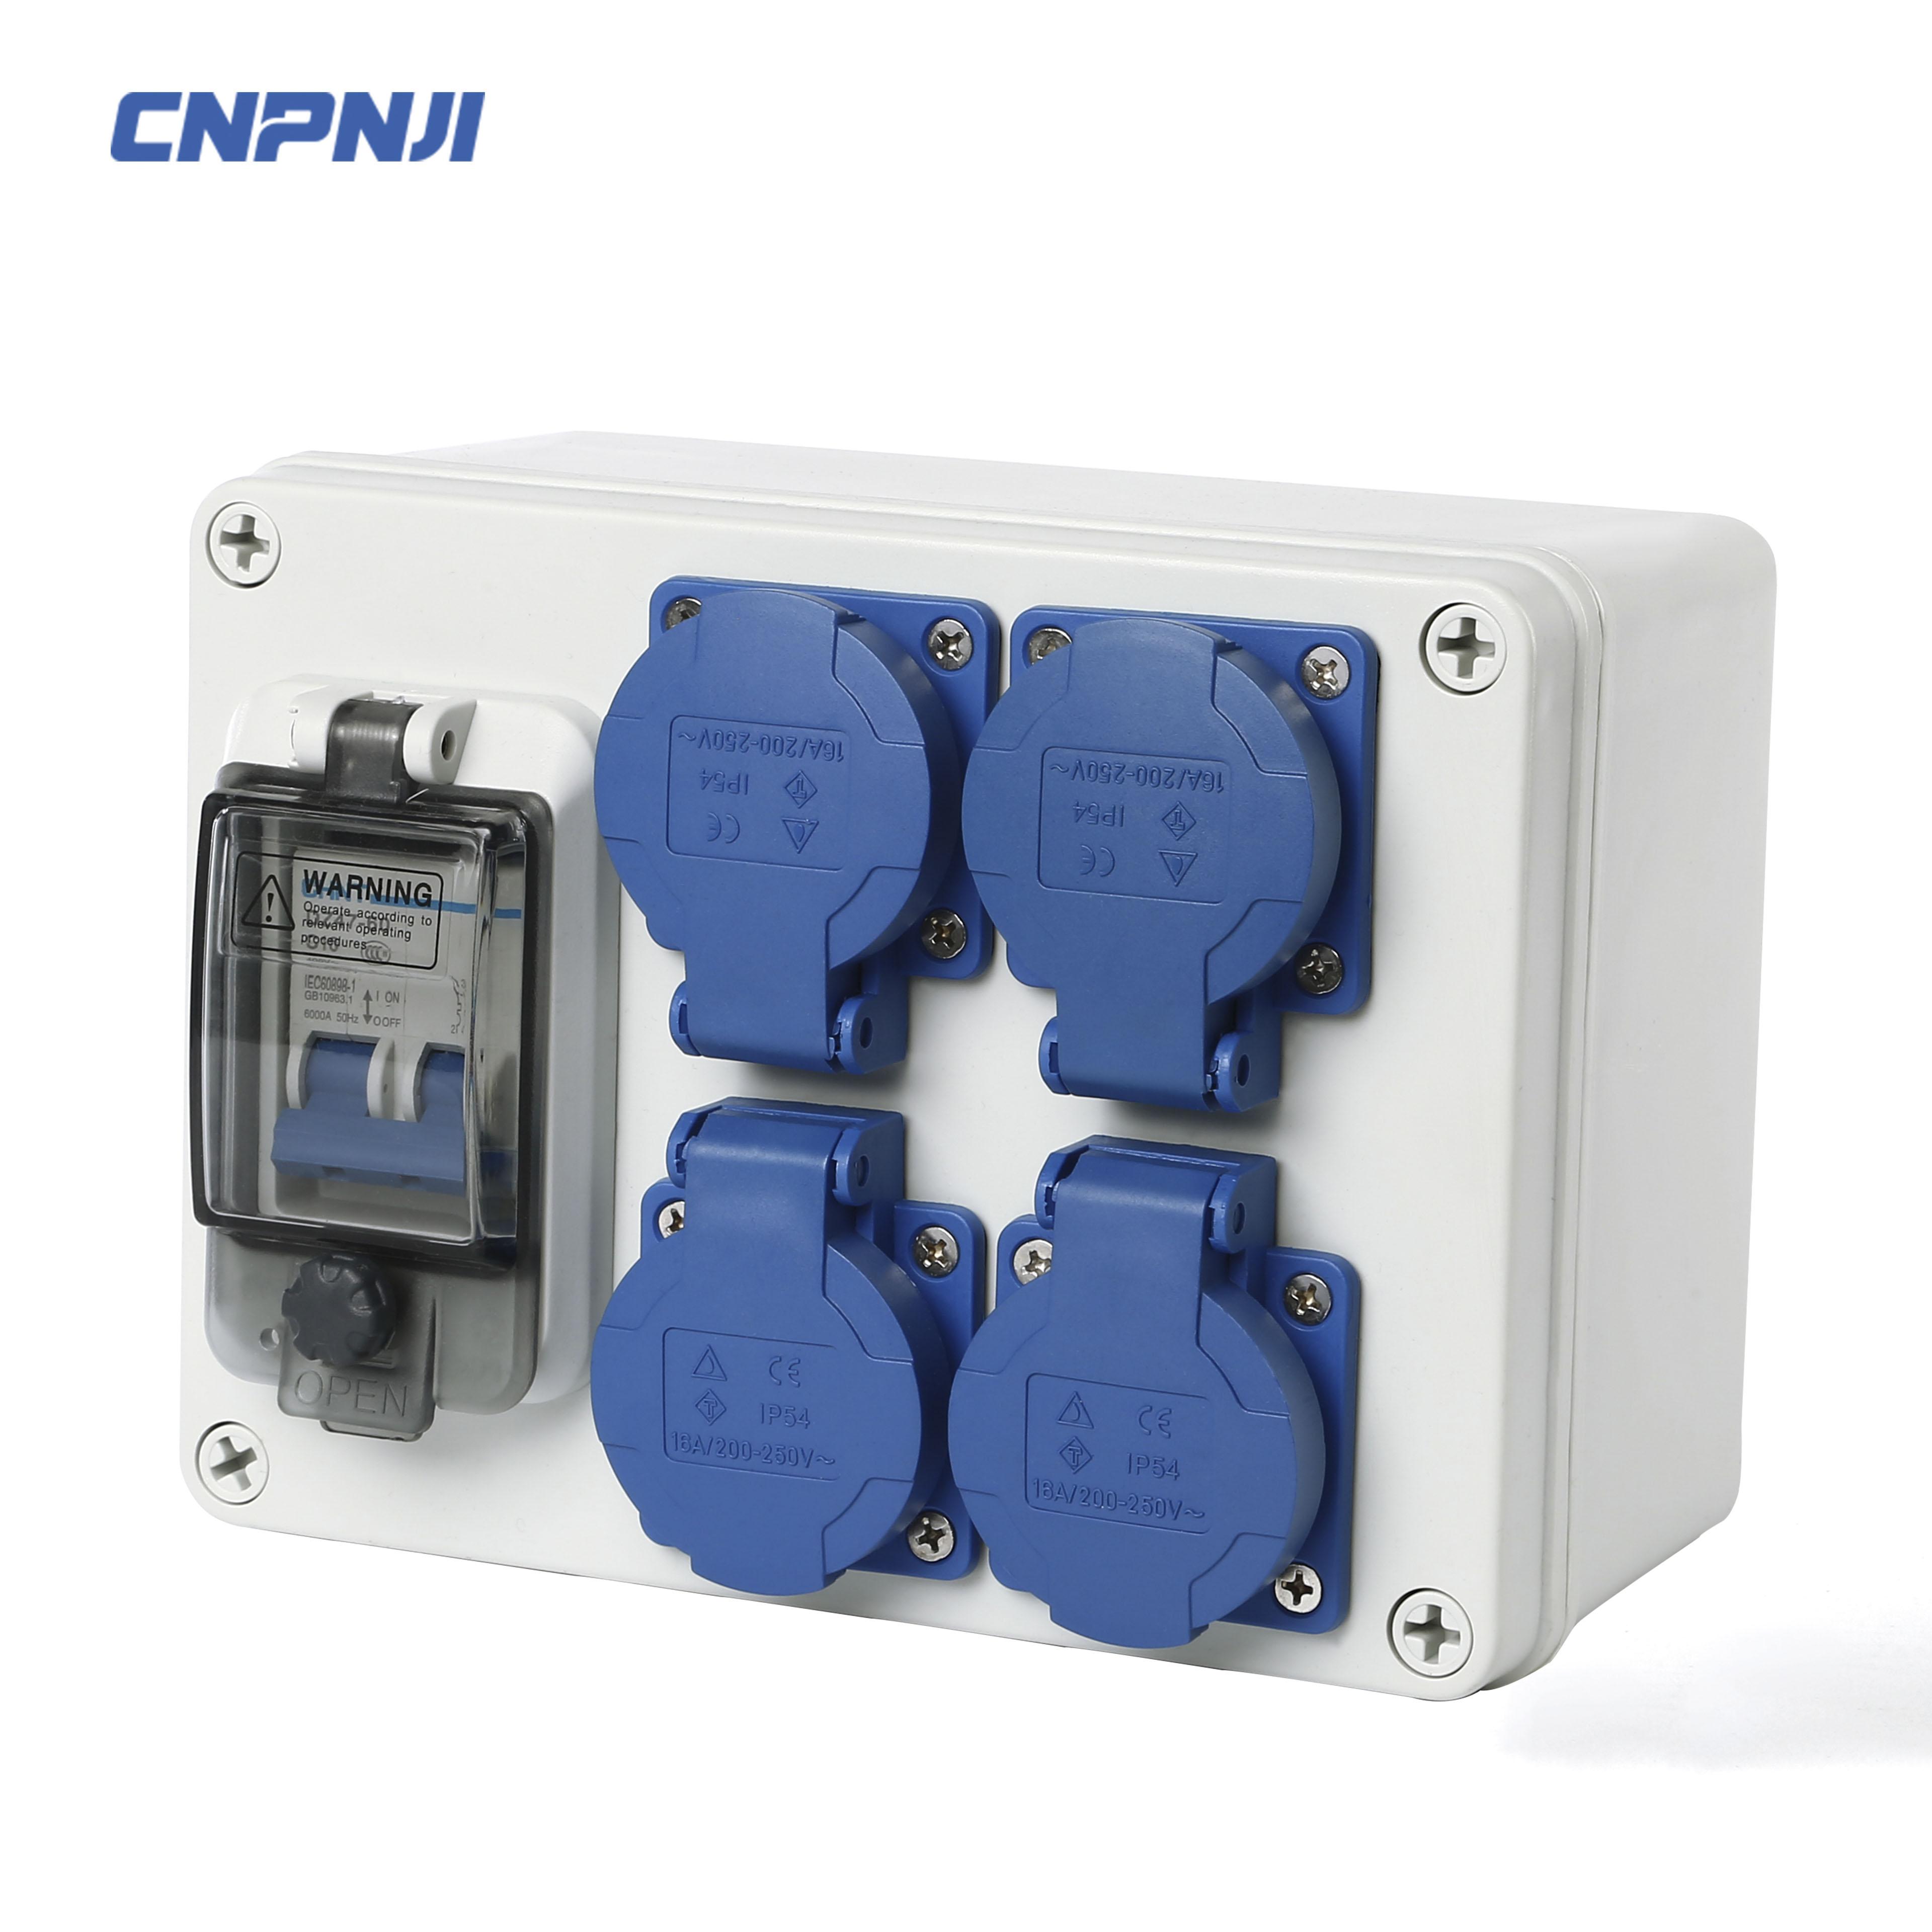 ABS PC Plastic Waterproof DIY Junction industrial sokcet Box Enclosure 250x150x100mm